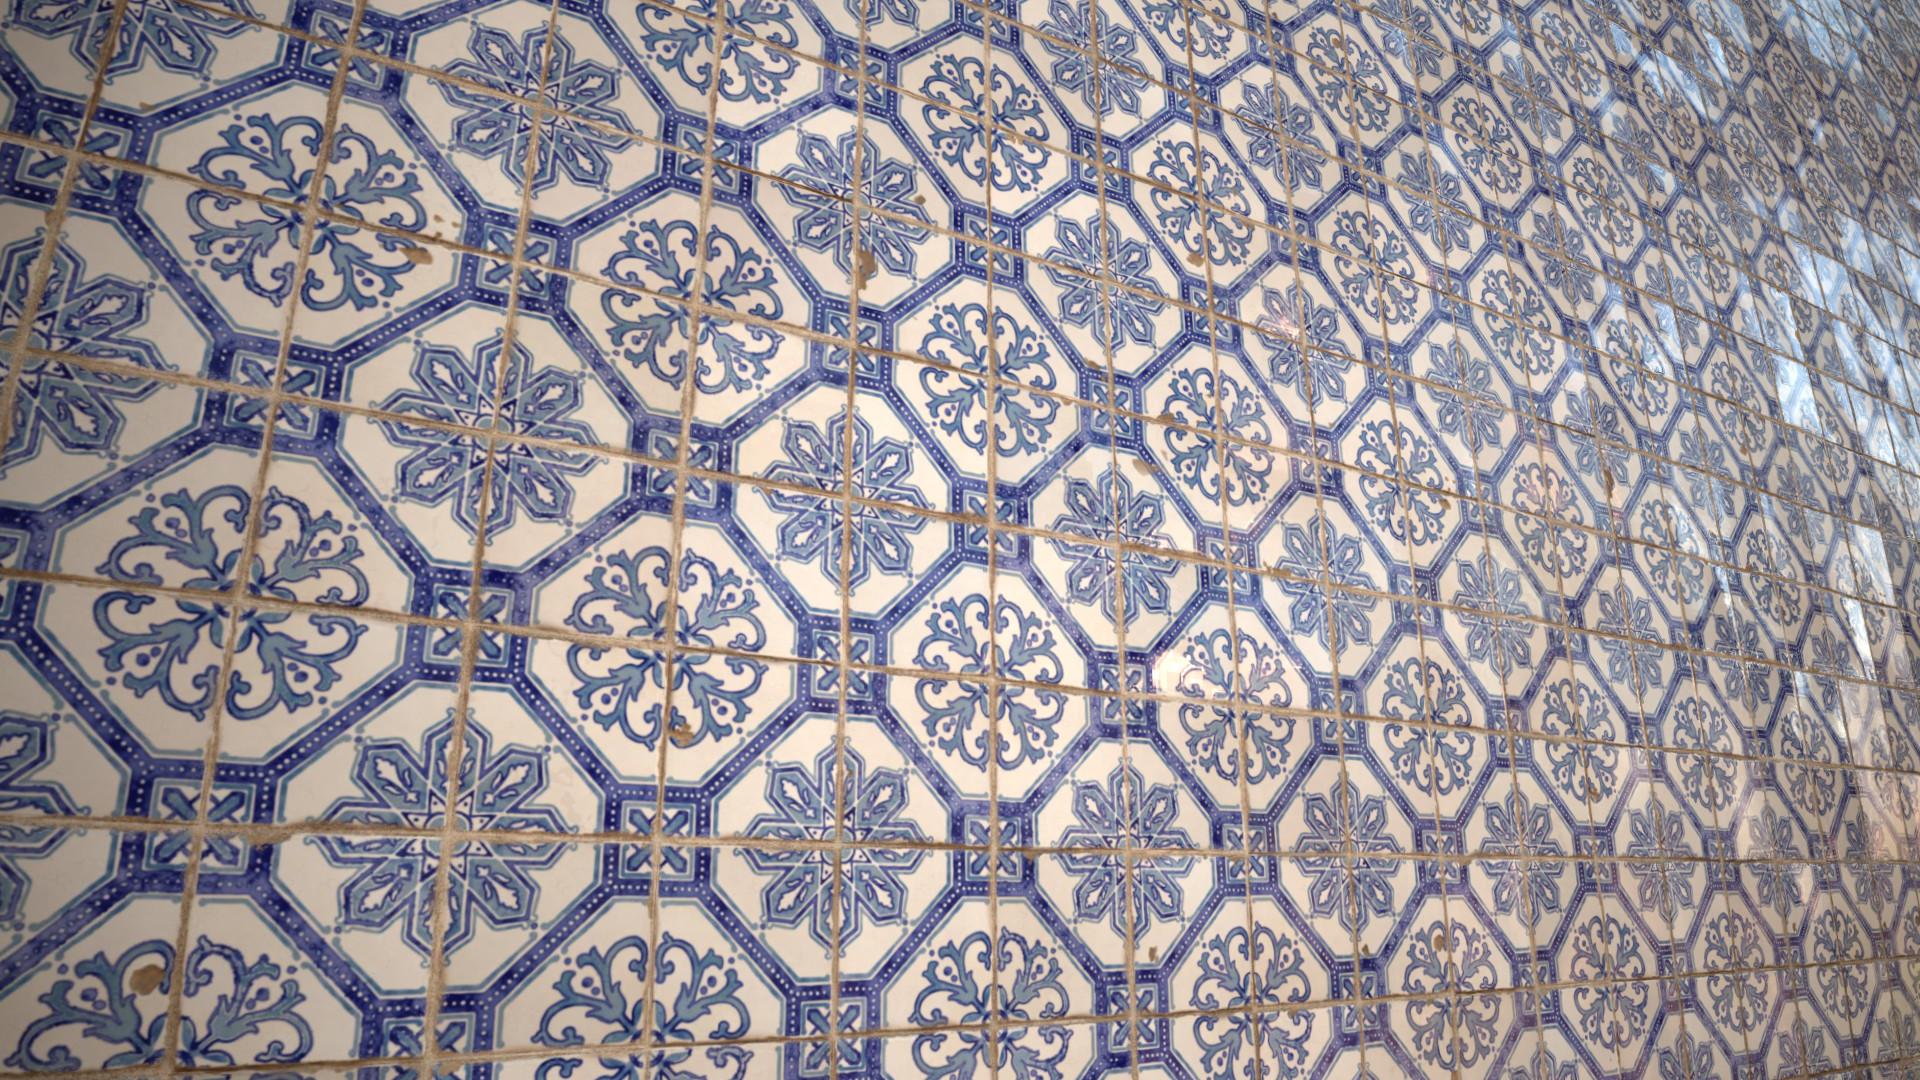 Alina godfrey azulejo alinagodfrey pattern4 plane